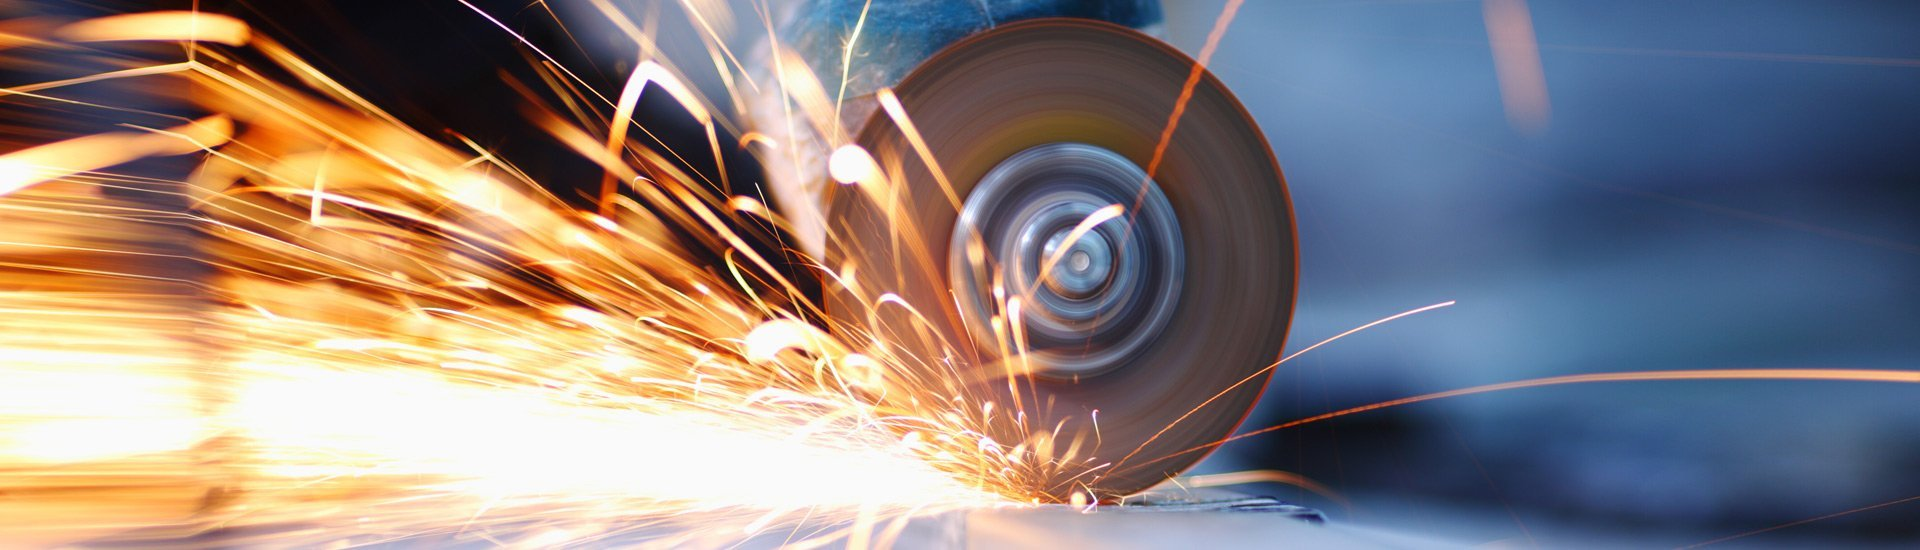 Abrasive wheels training services